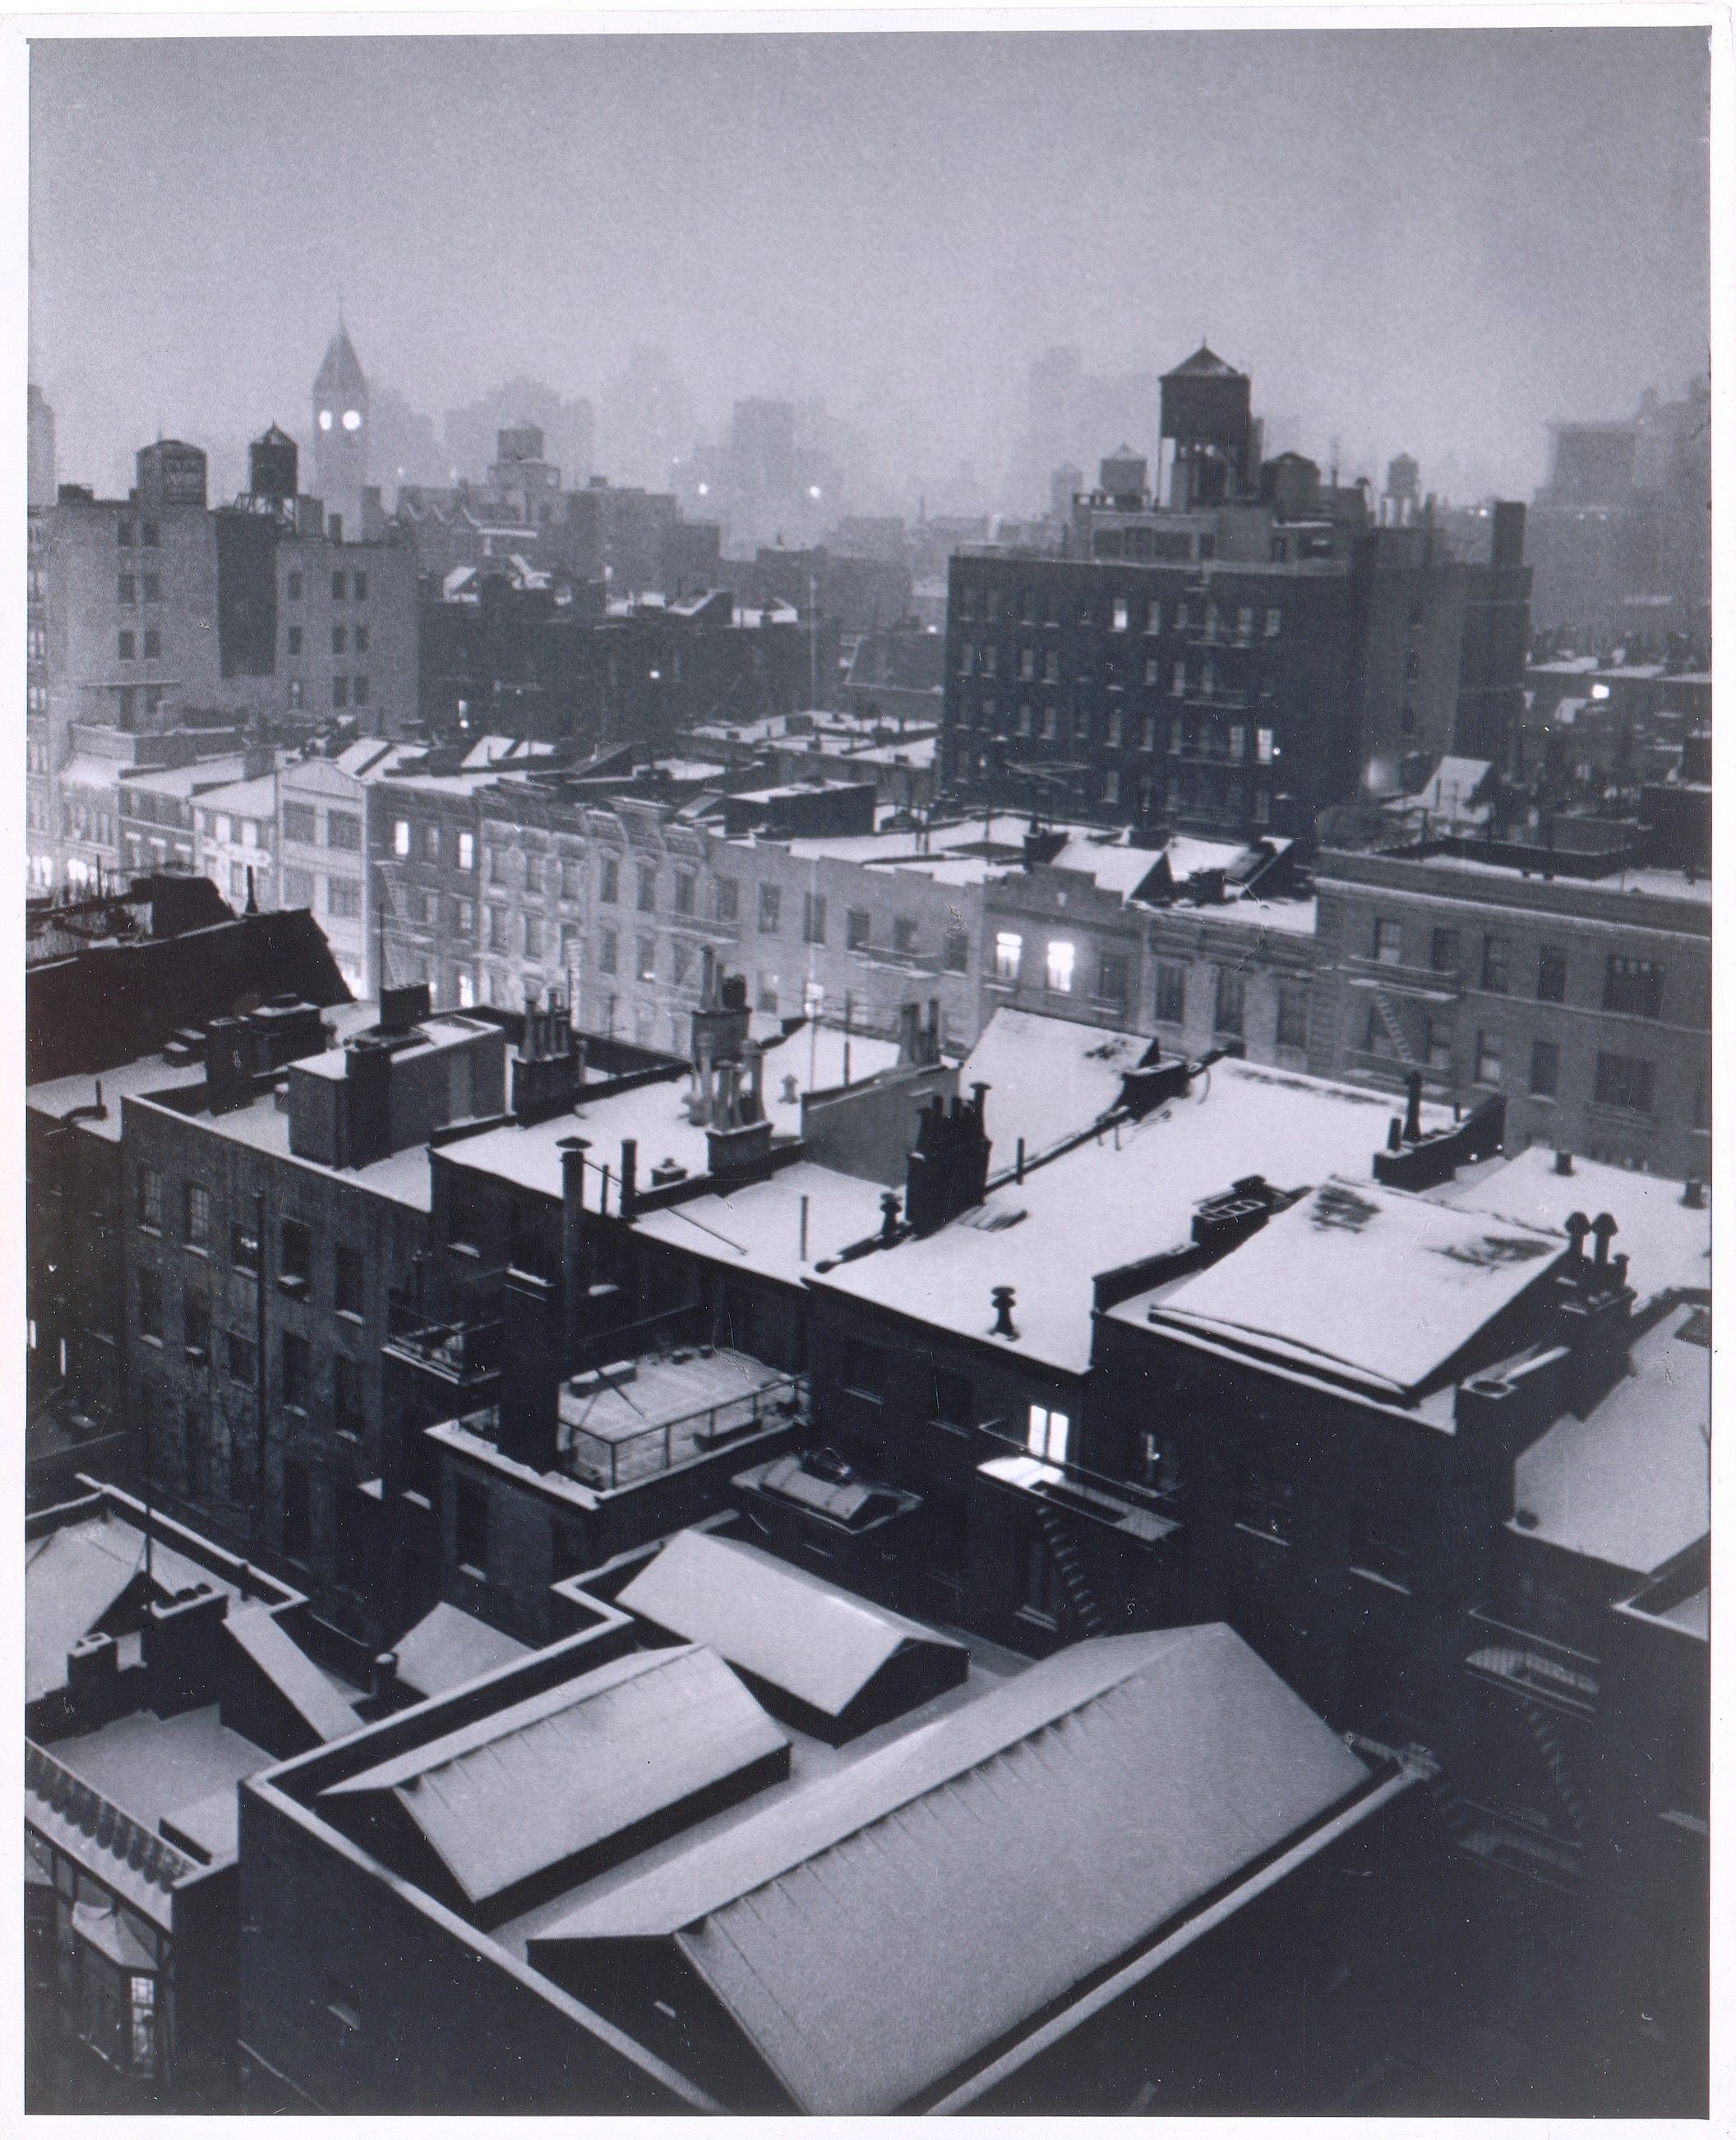 Greenwich Village Rooftops, Evening - 1954